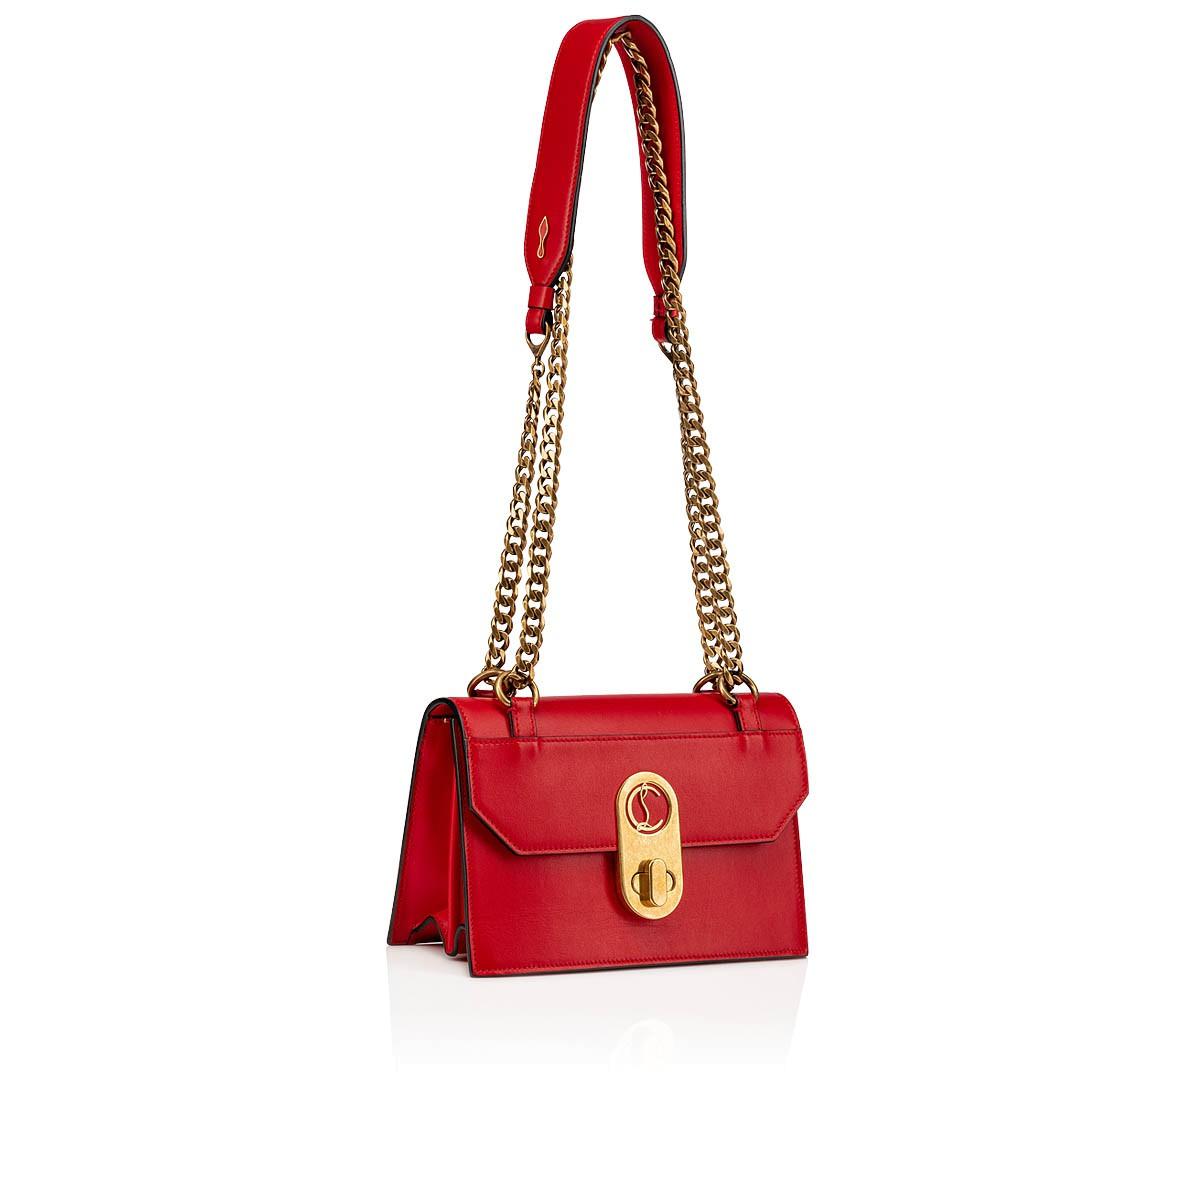 Women Bags - Elisa Mini - Christian Louboutin